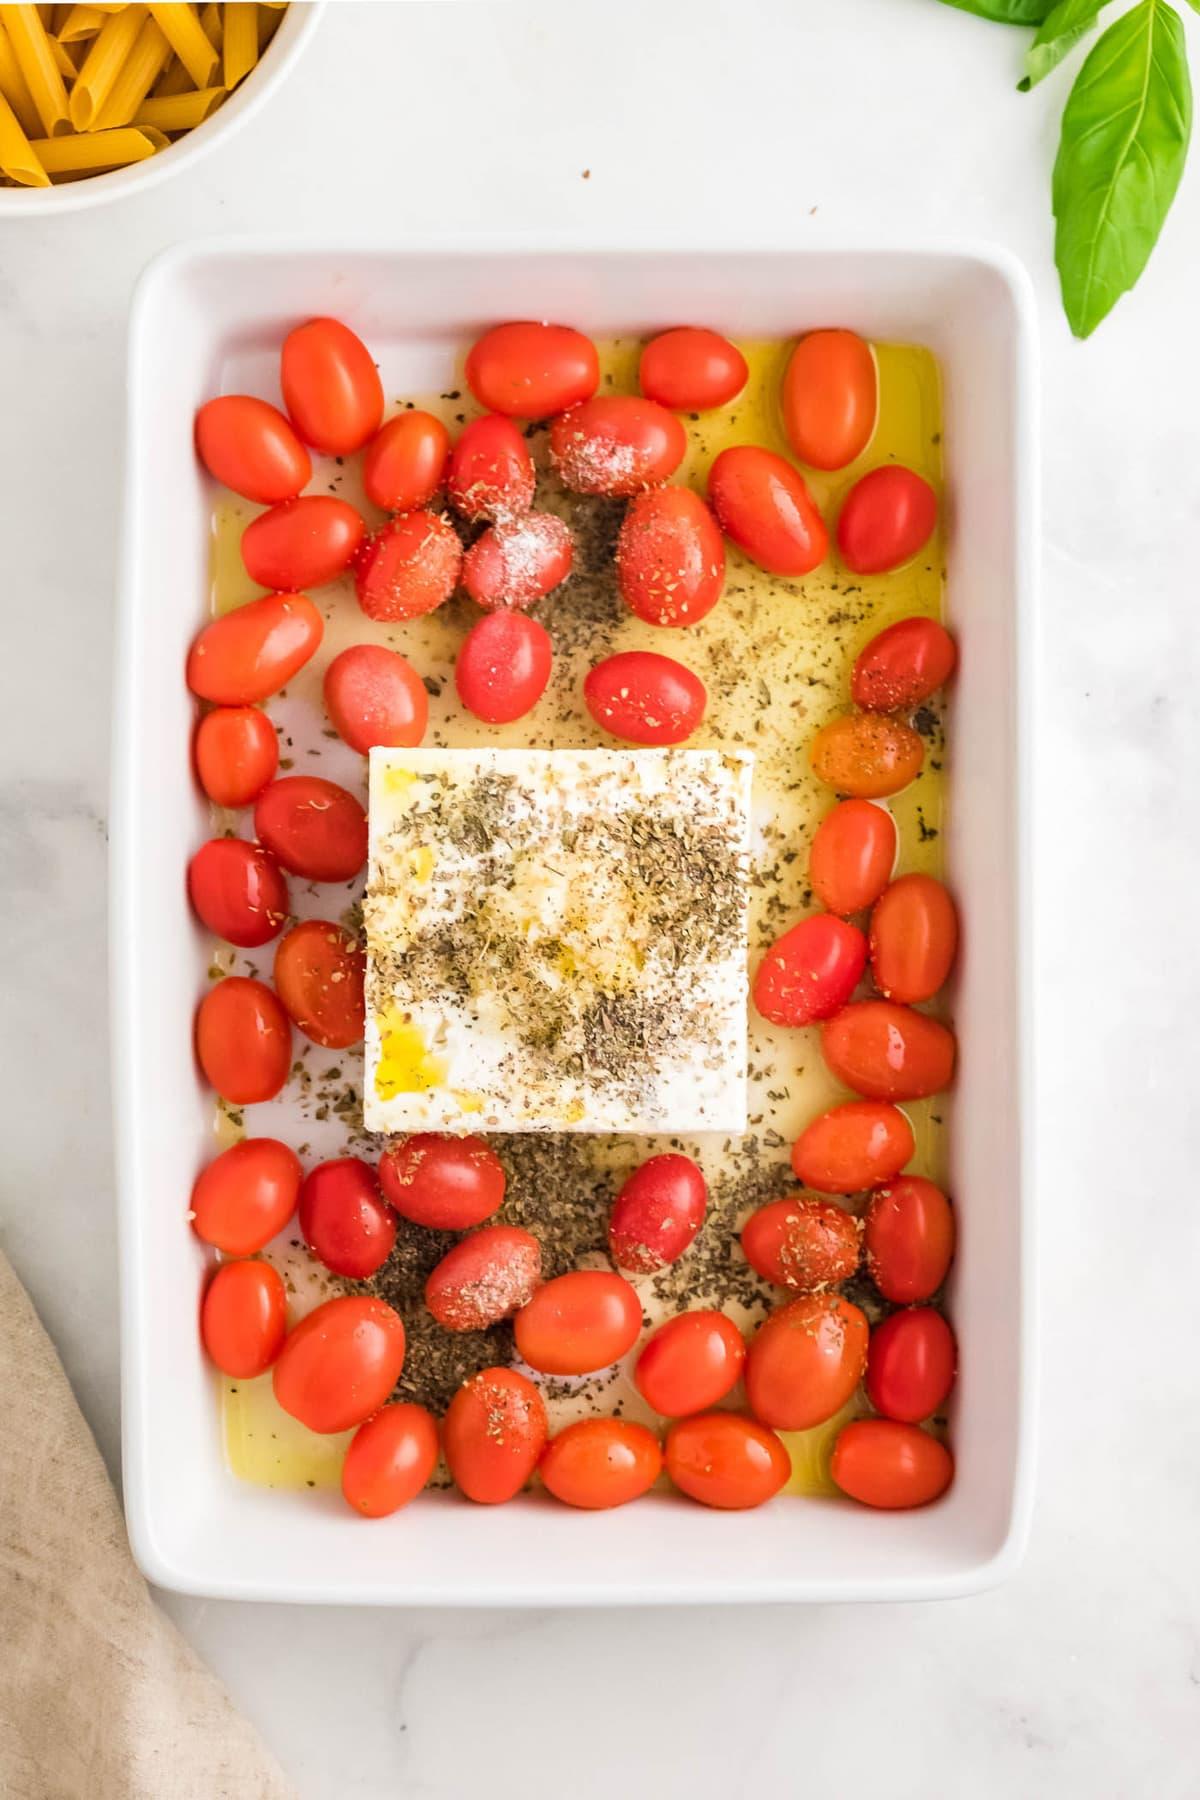 white baking dish, tomatoes, olive oil, block of feta, italian seasonings, pasta, basil